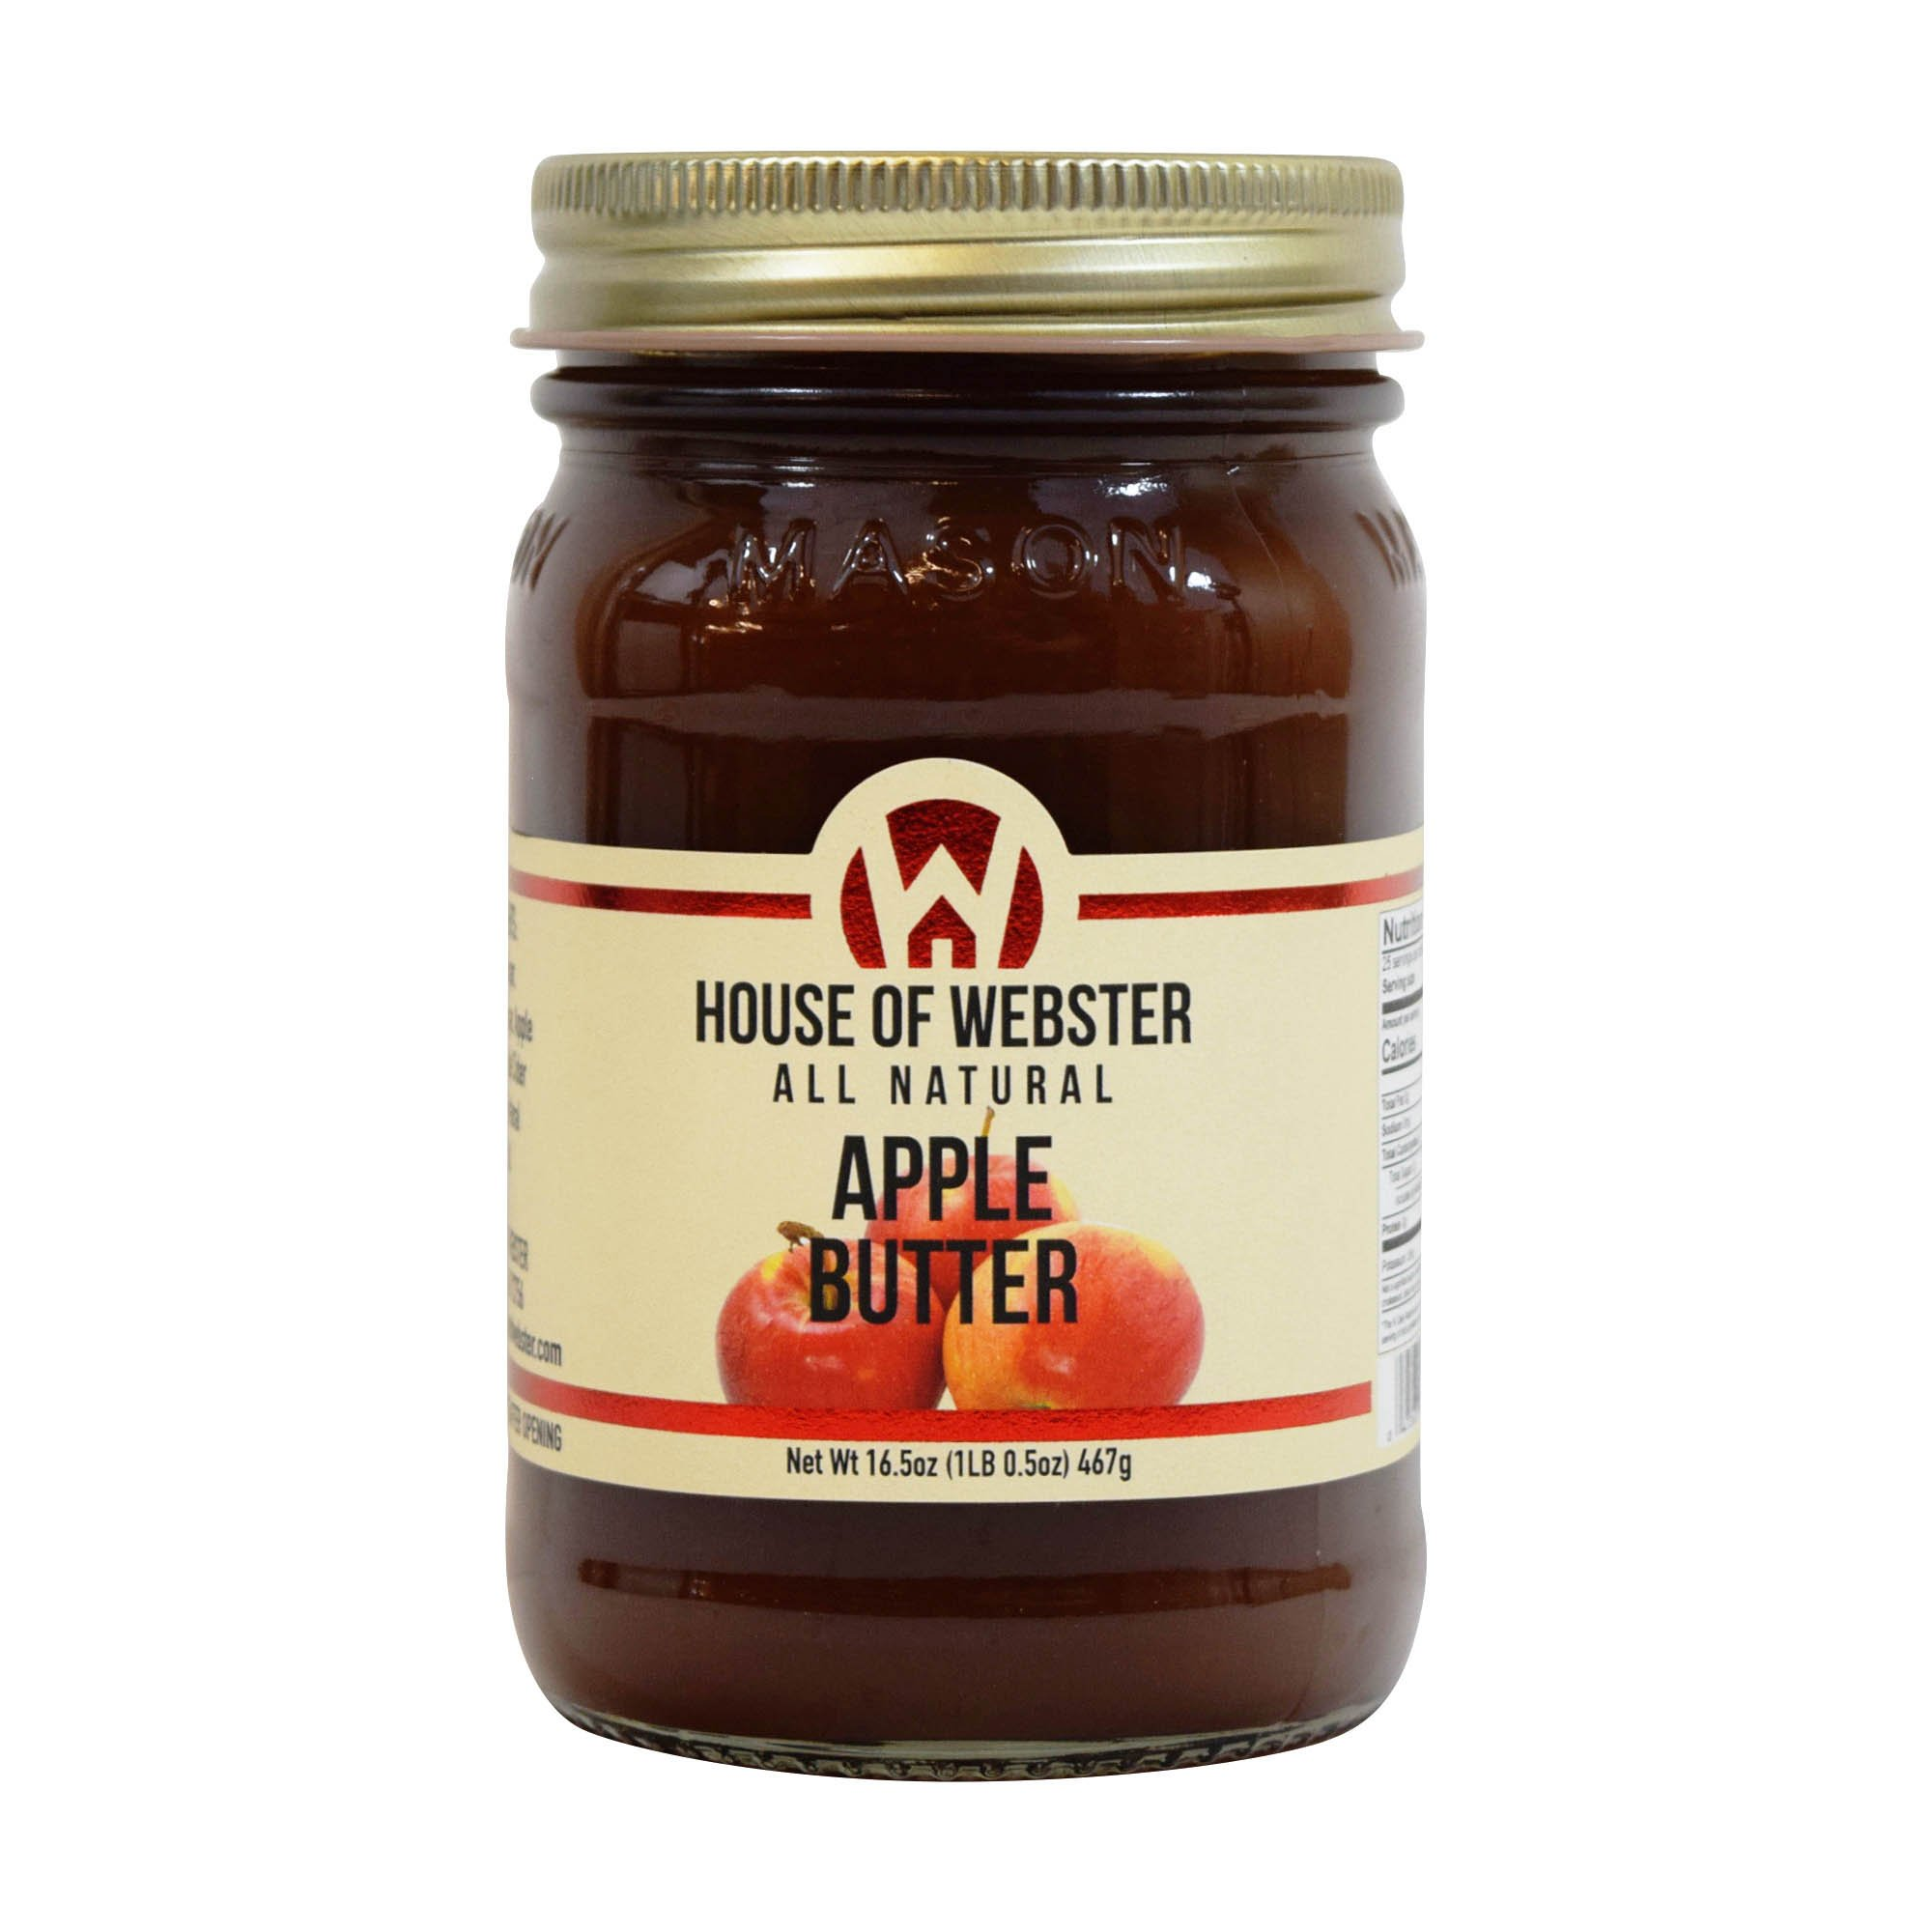 House of Webster All Natural Apple Butter Fruit Spread 16.5 oz